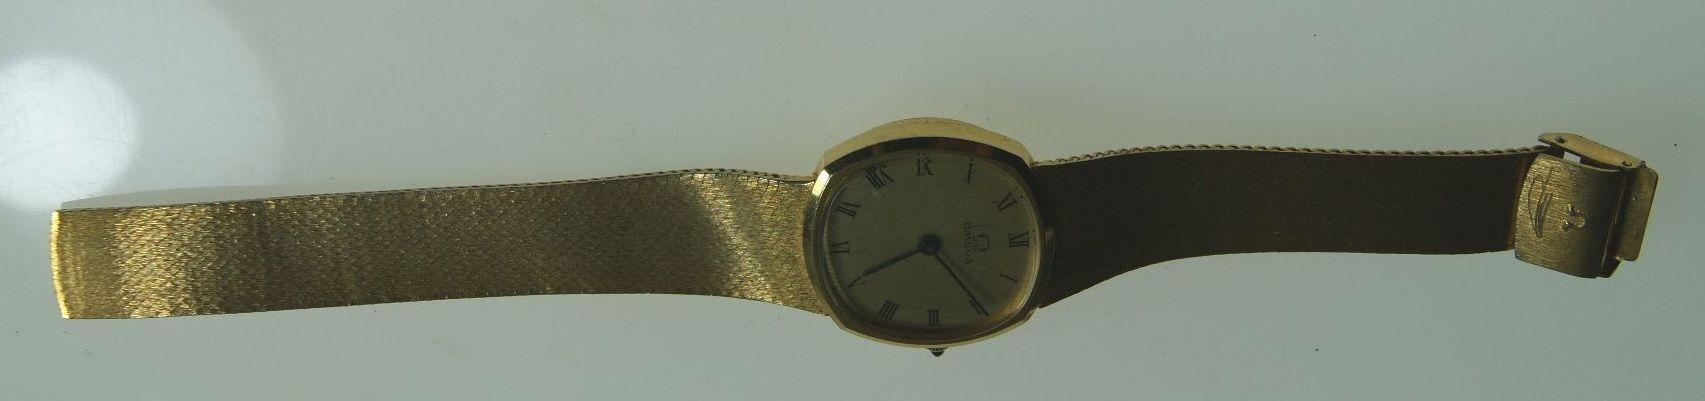 Zegarek Omega - uszkodzony